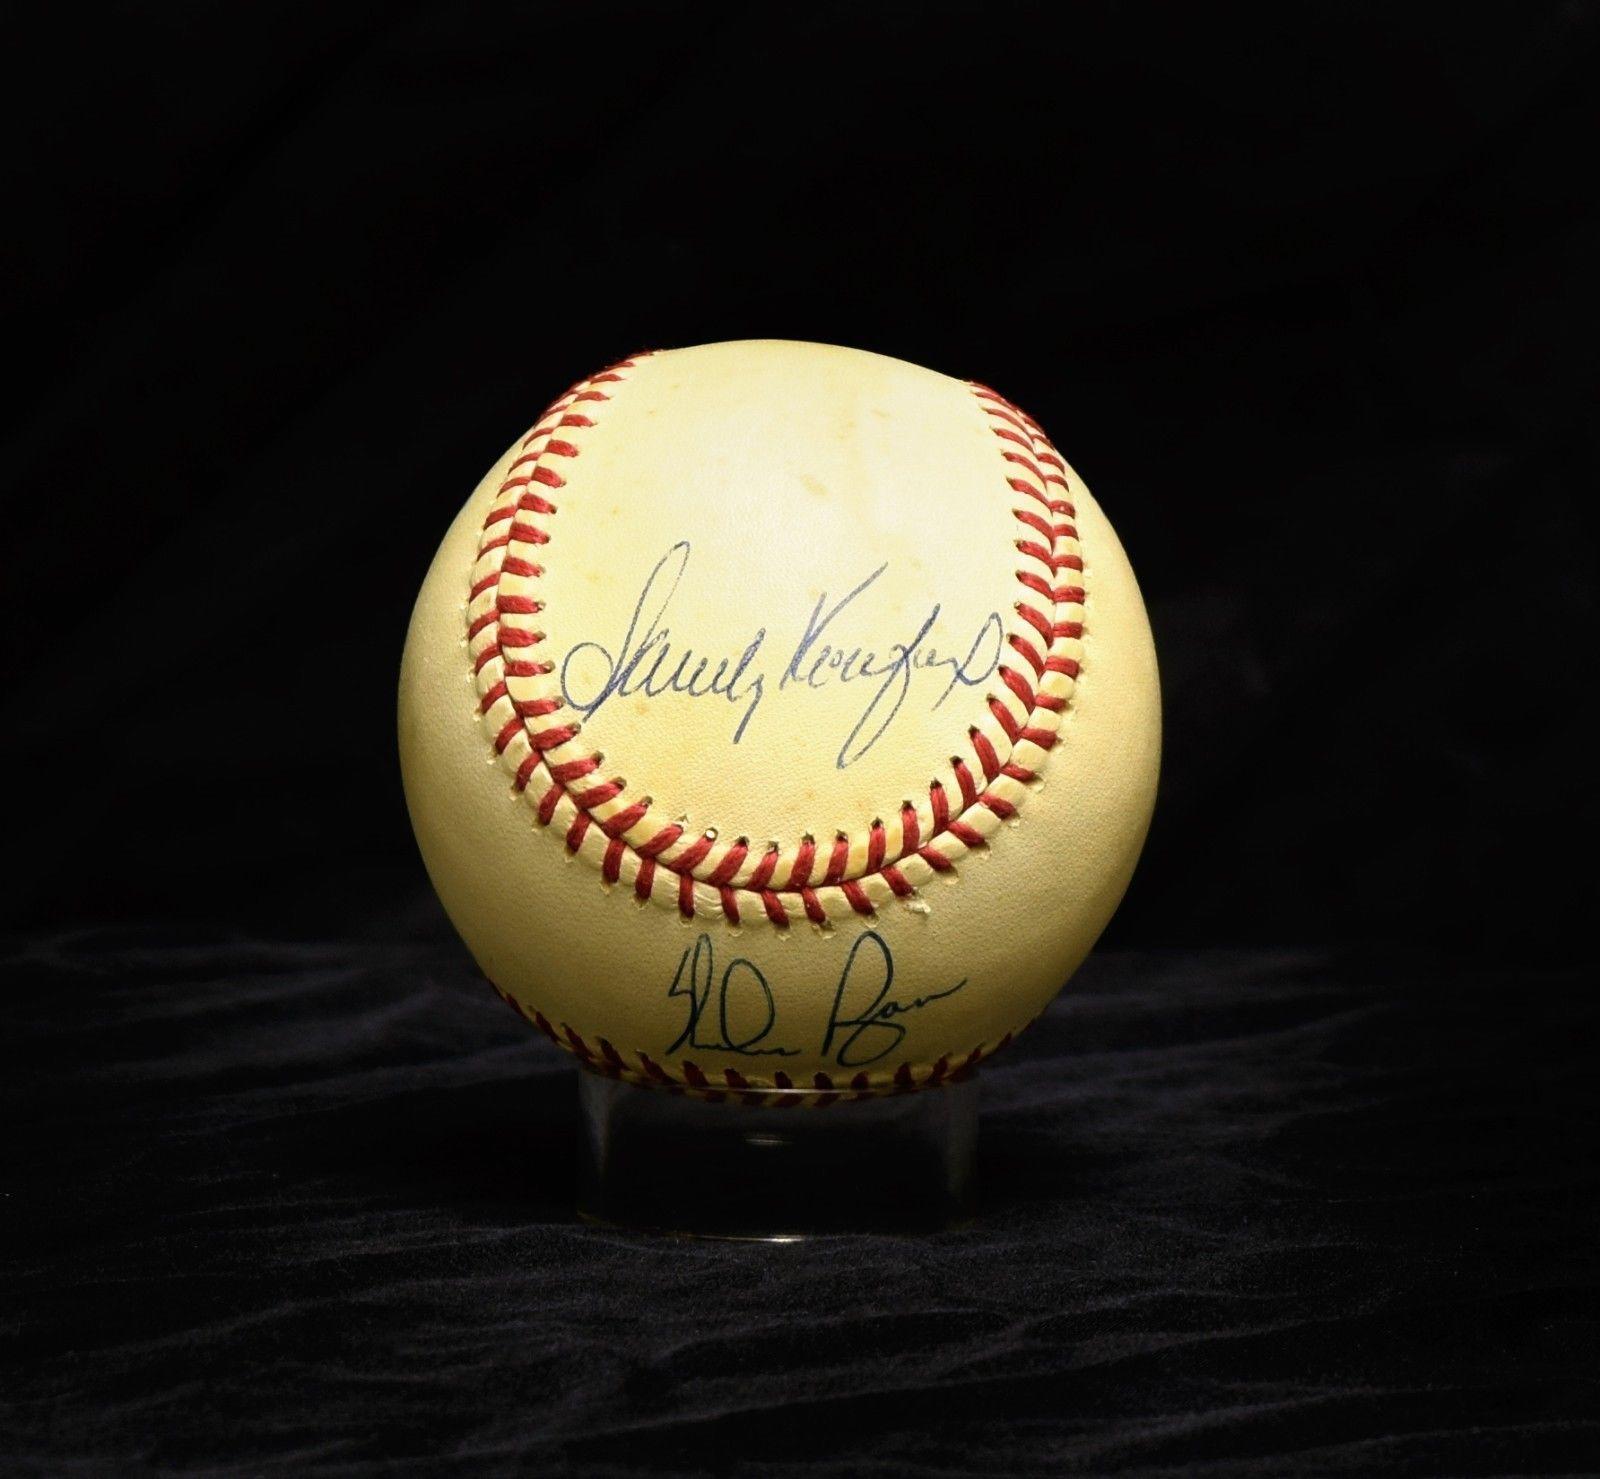 Sandy Koufax Bob Feller Nolan Ryan Signed Autographed Baseball Psa Dna I91472 Autographed Baseballs Sandy Koufax Bob Feller